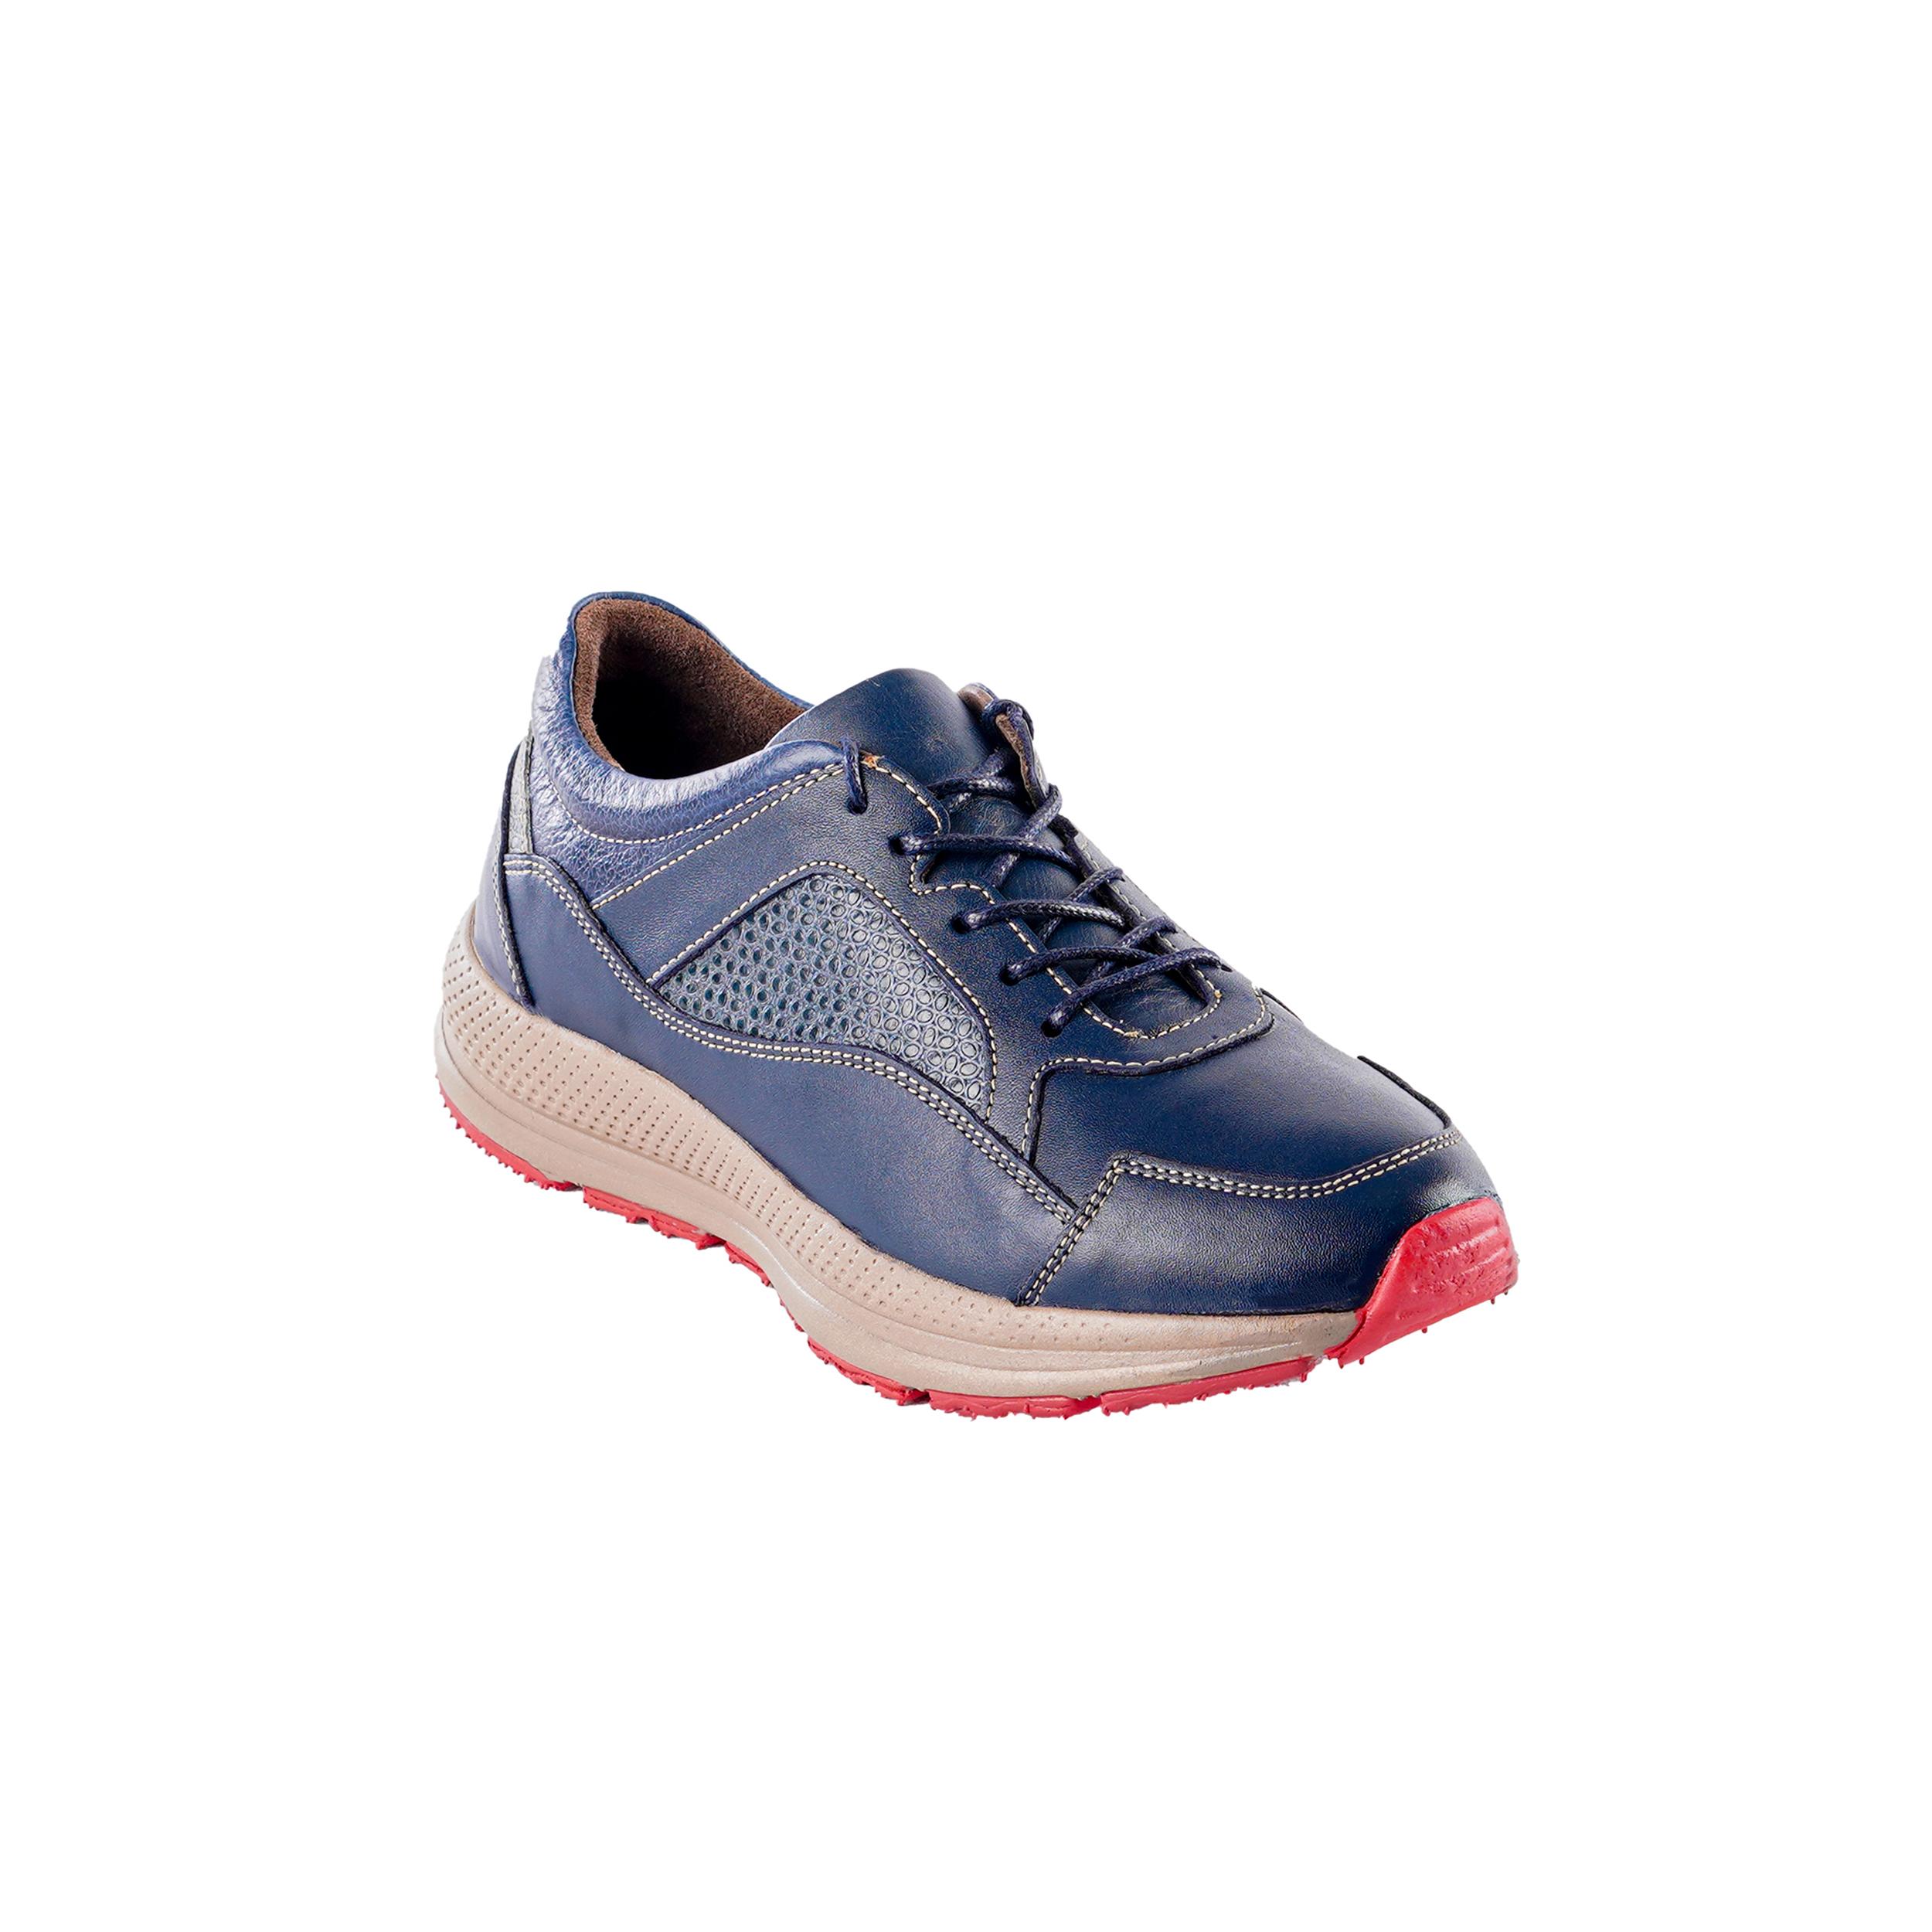 کفش روزمره زنانه صاد کد PP2301